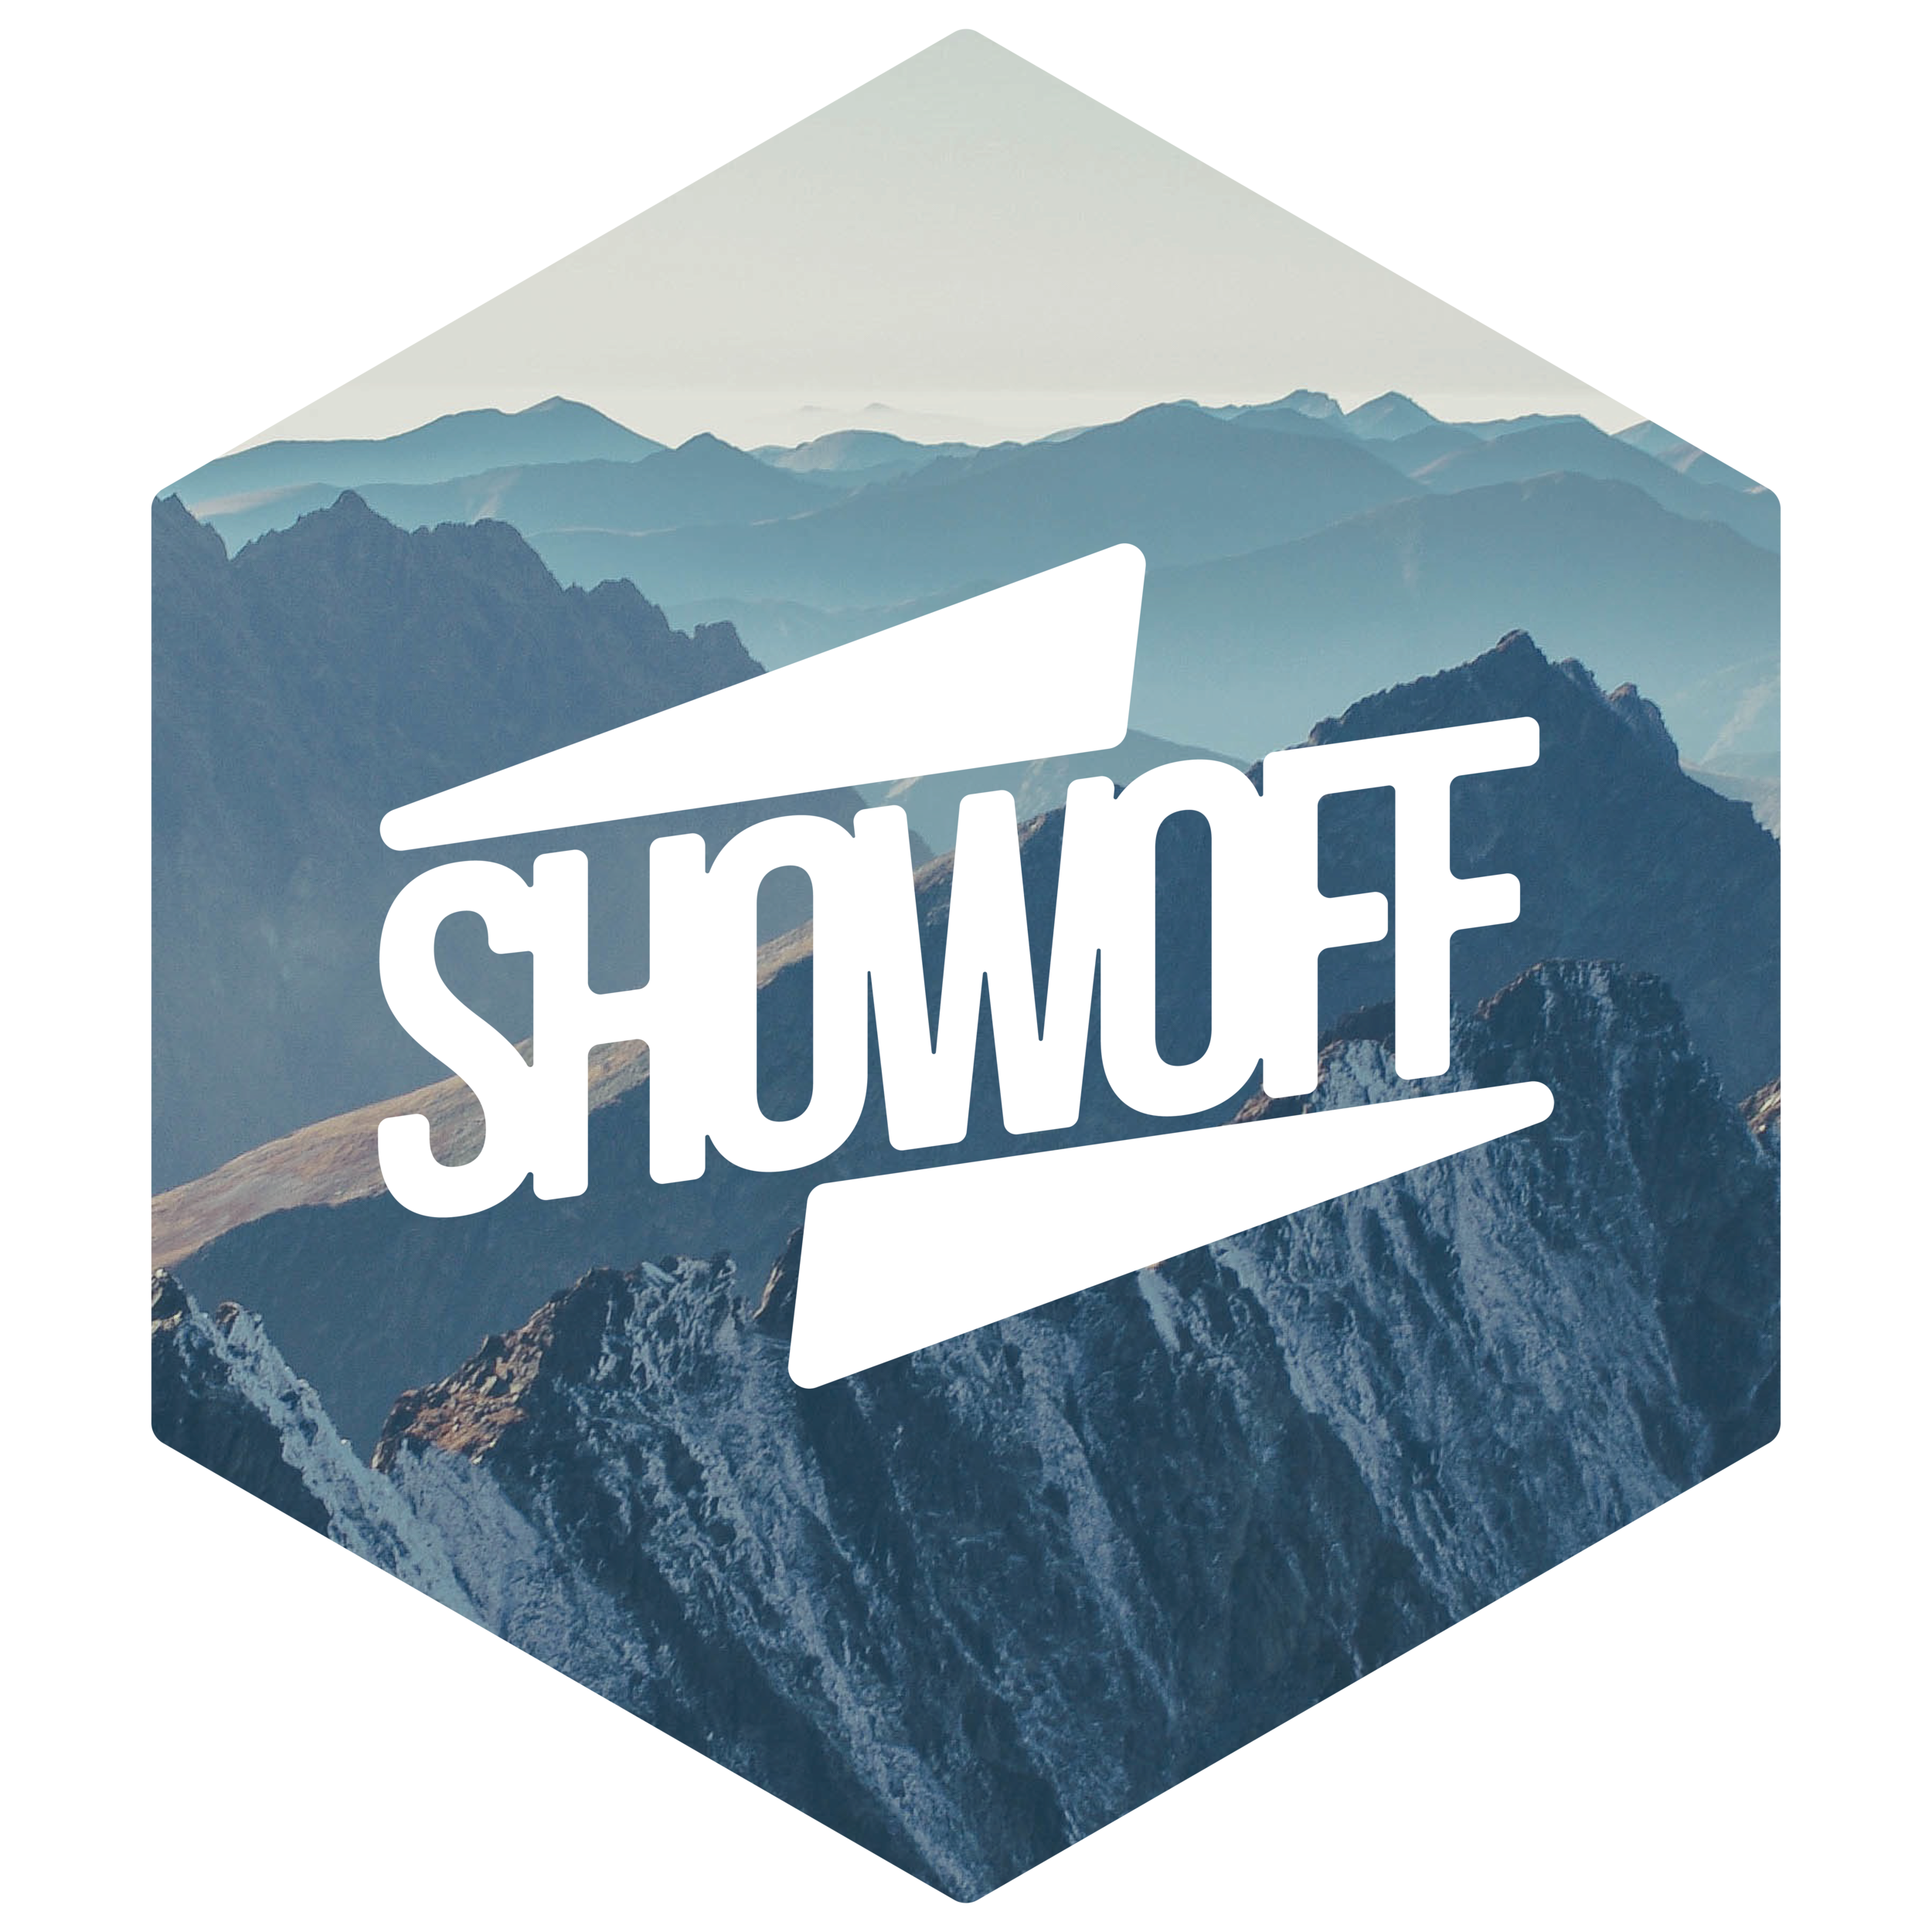 showoff-geo-large-01.png